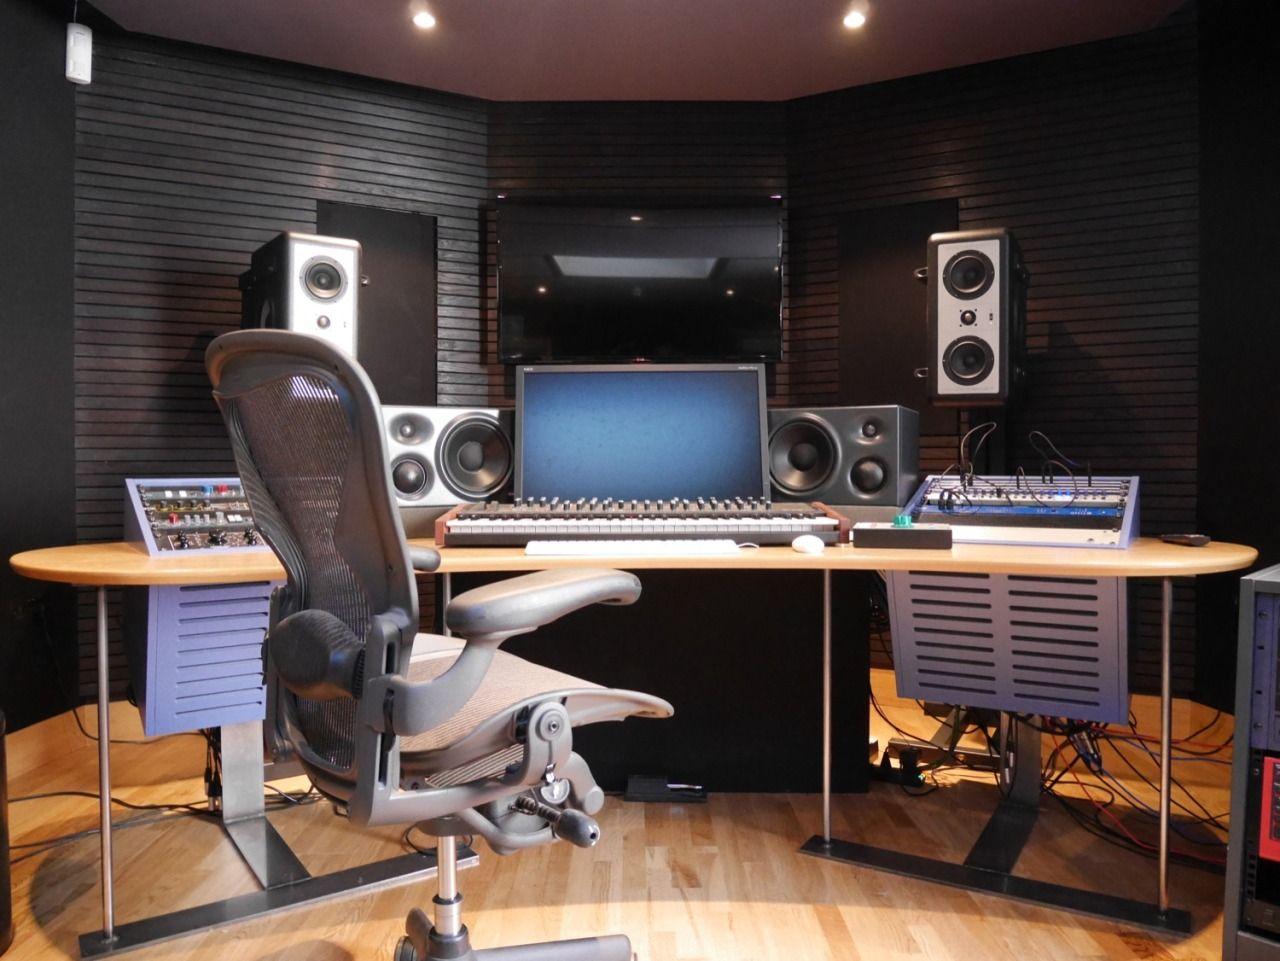 Recording Studio Chair - Fuck yeah studio porn